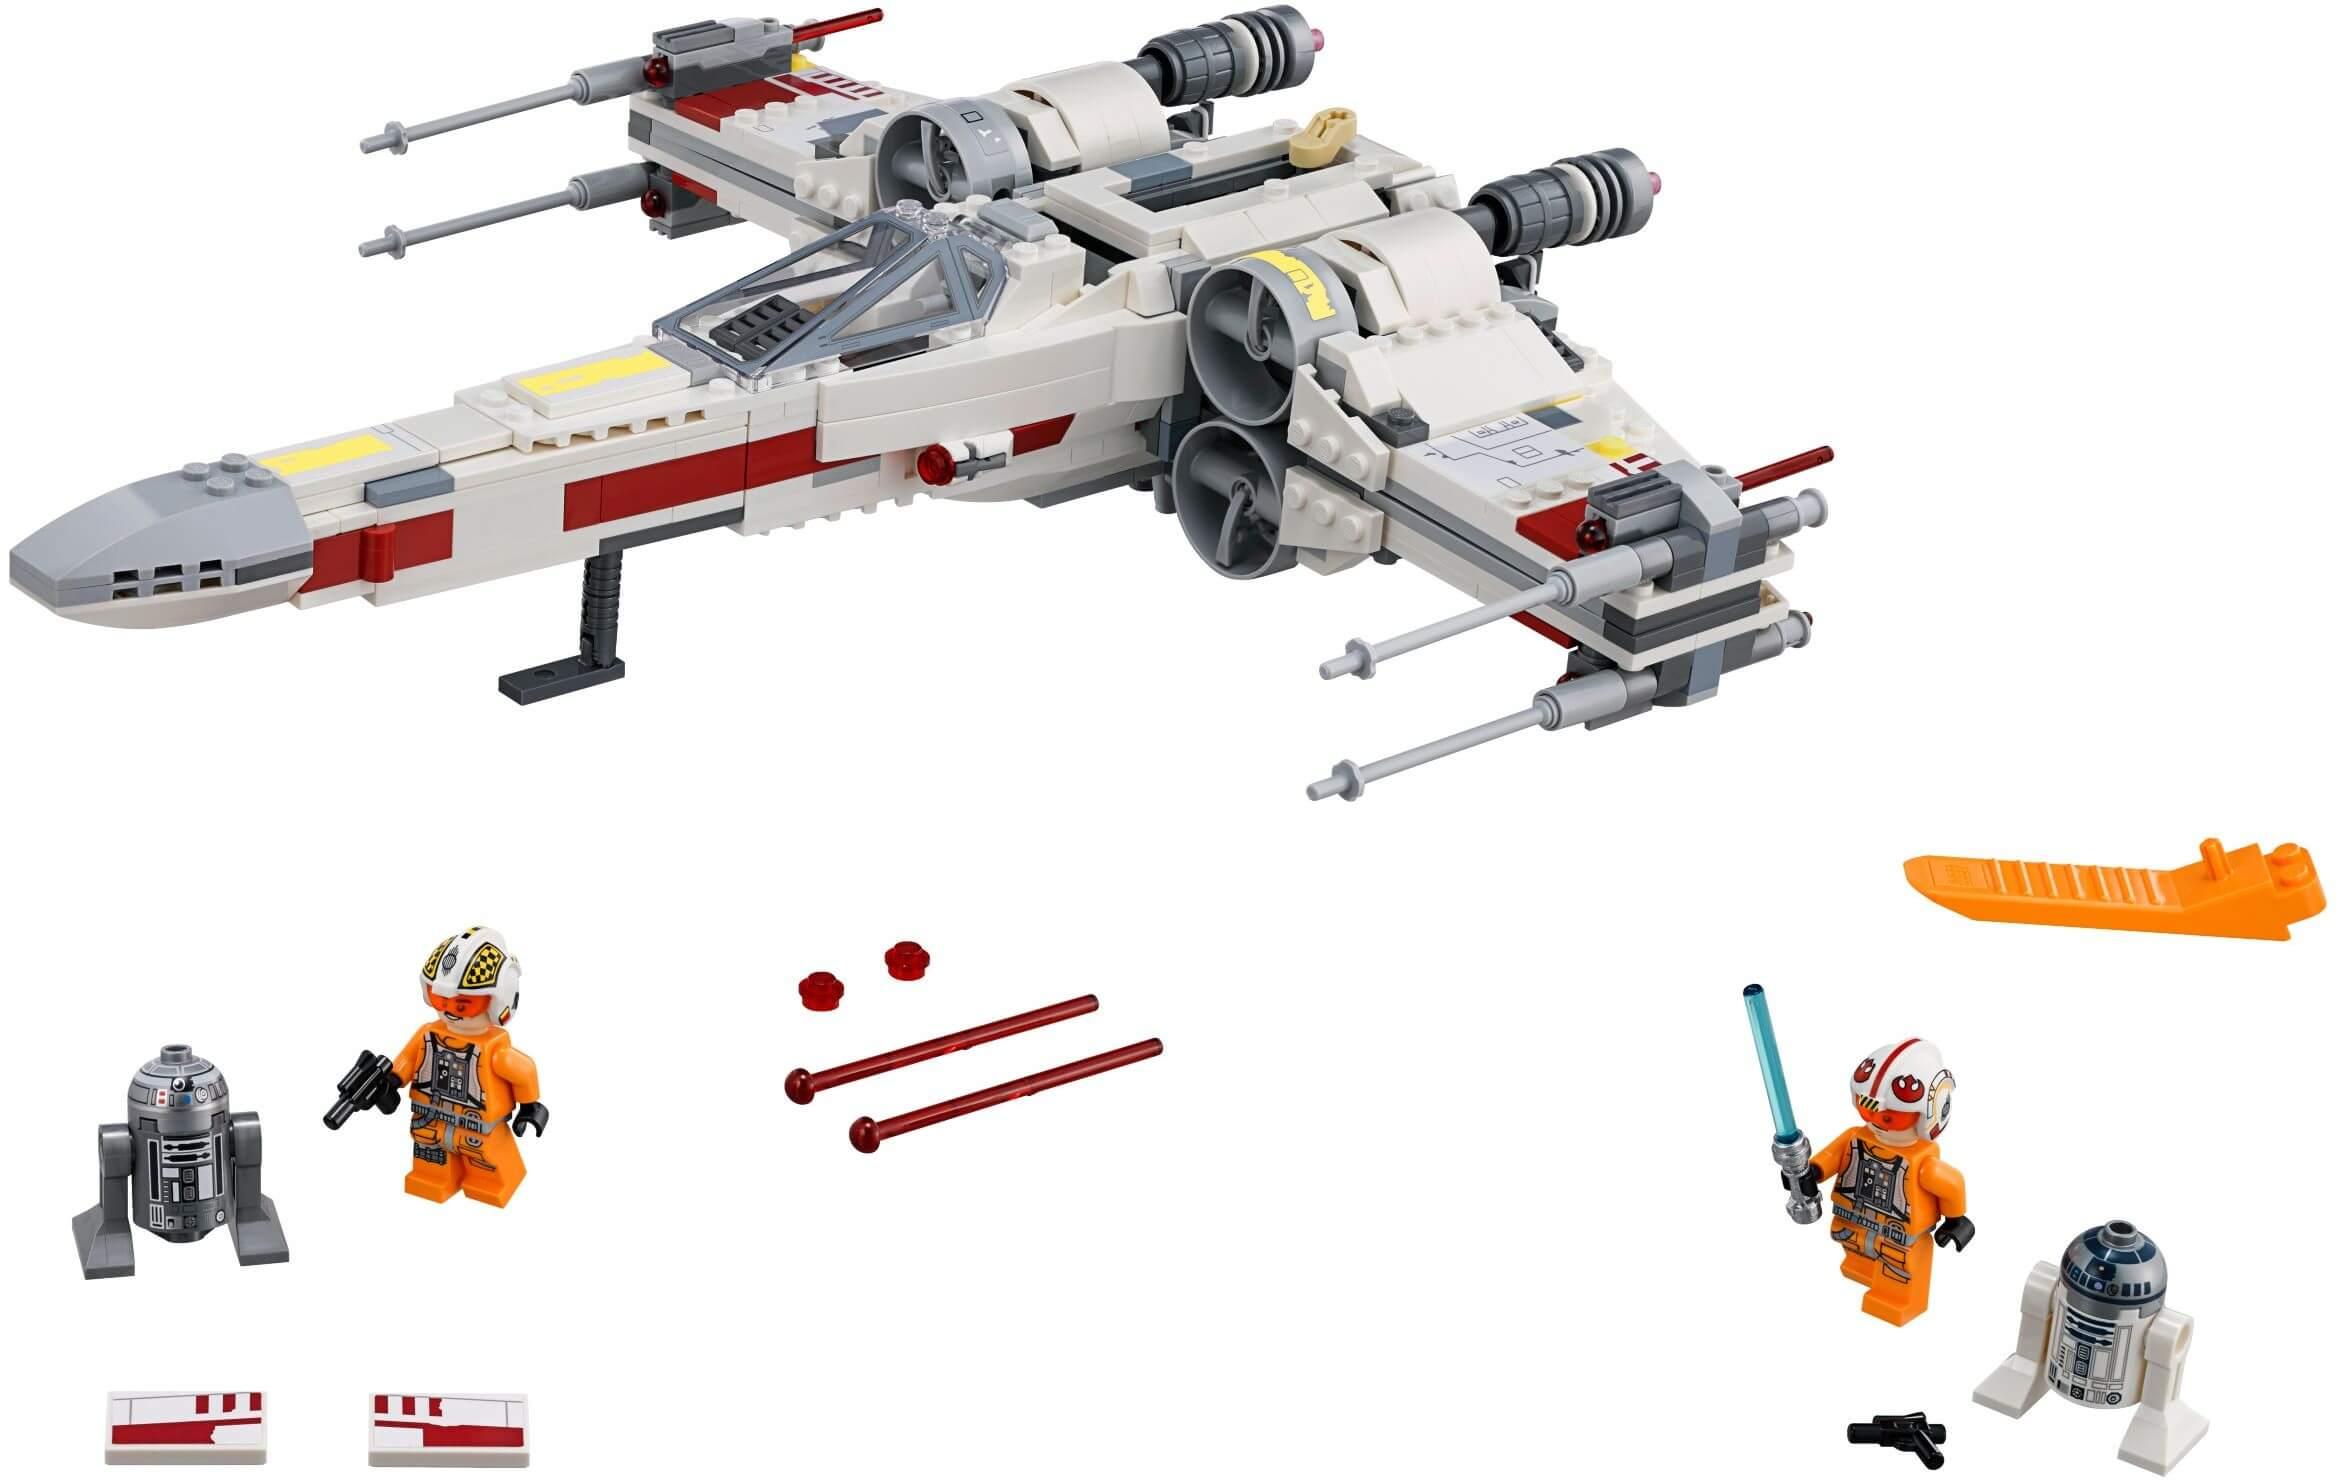 Mua đồ chơi LEGO 75218 - LEGO Star Wars 75218 - Máy Bay Chiến Đấu X-Wing Starfighter (LEGO 75218 X-Wing Starfighter)